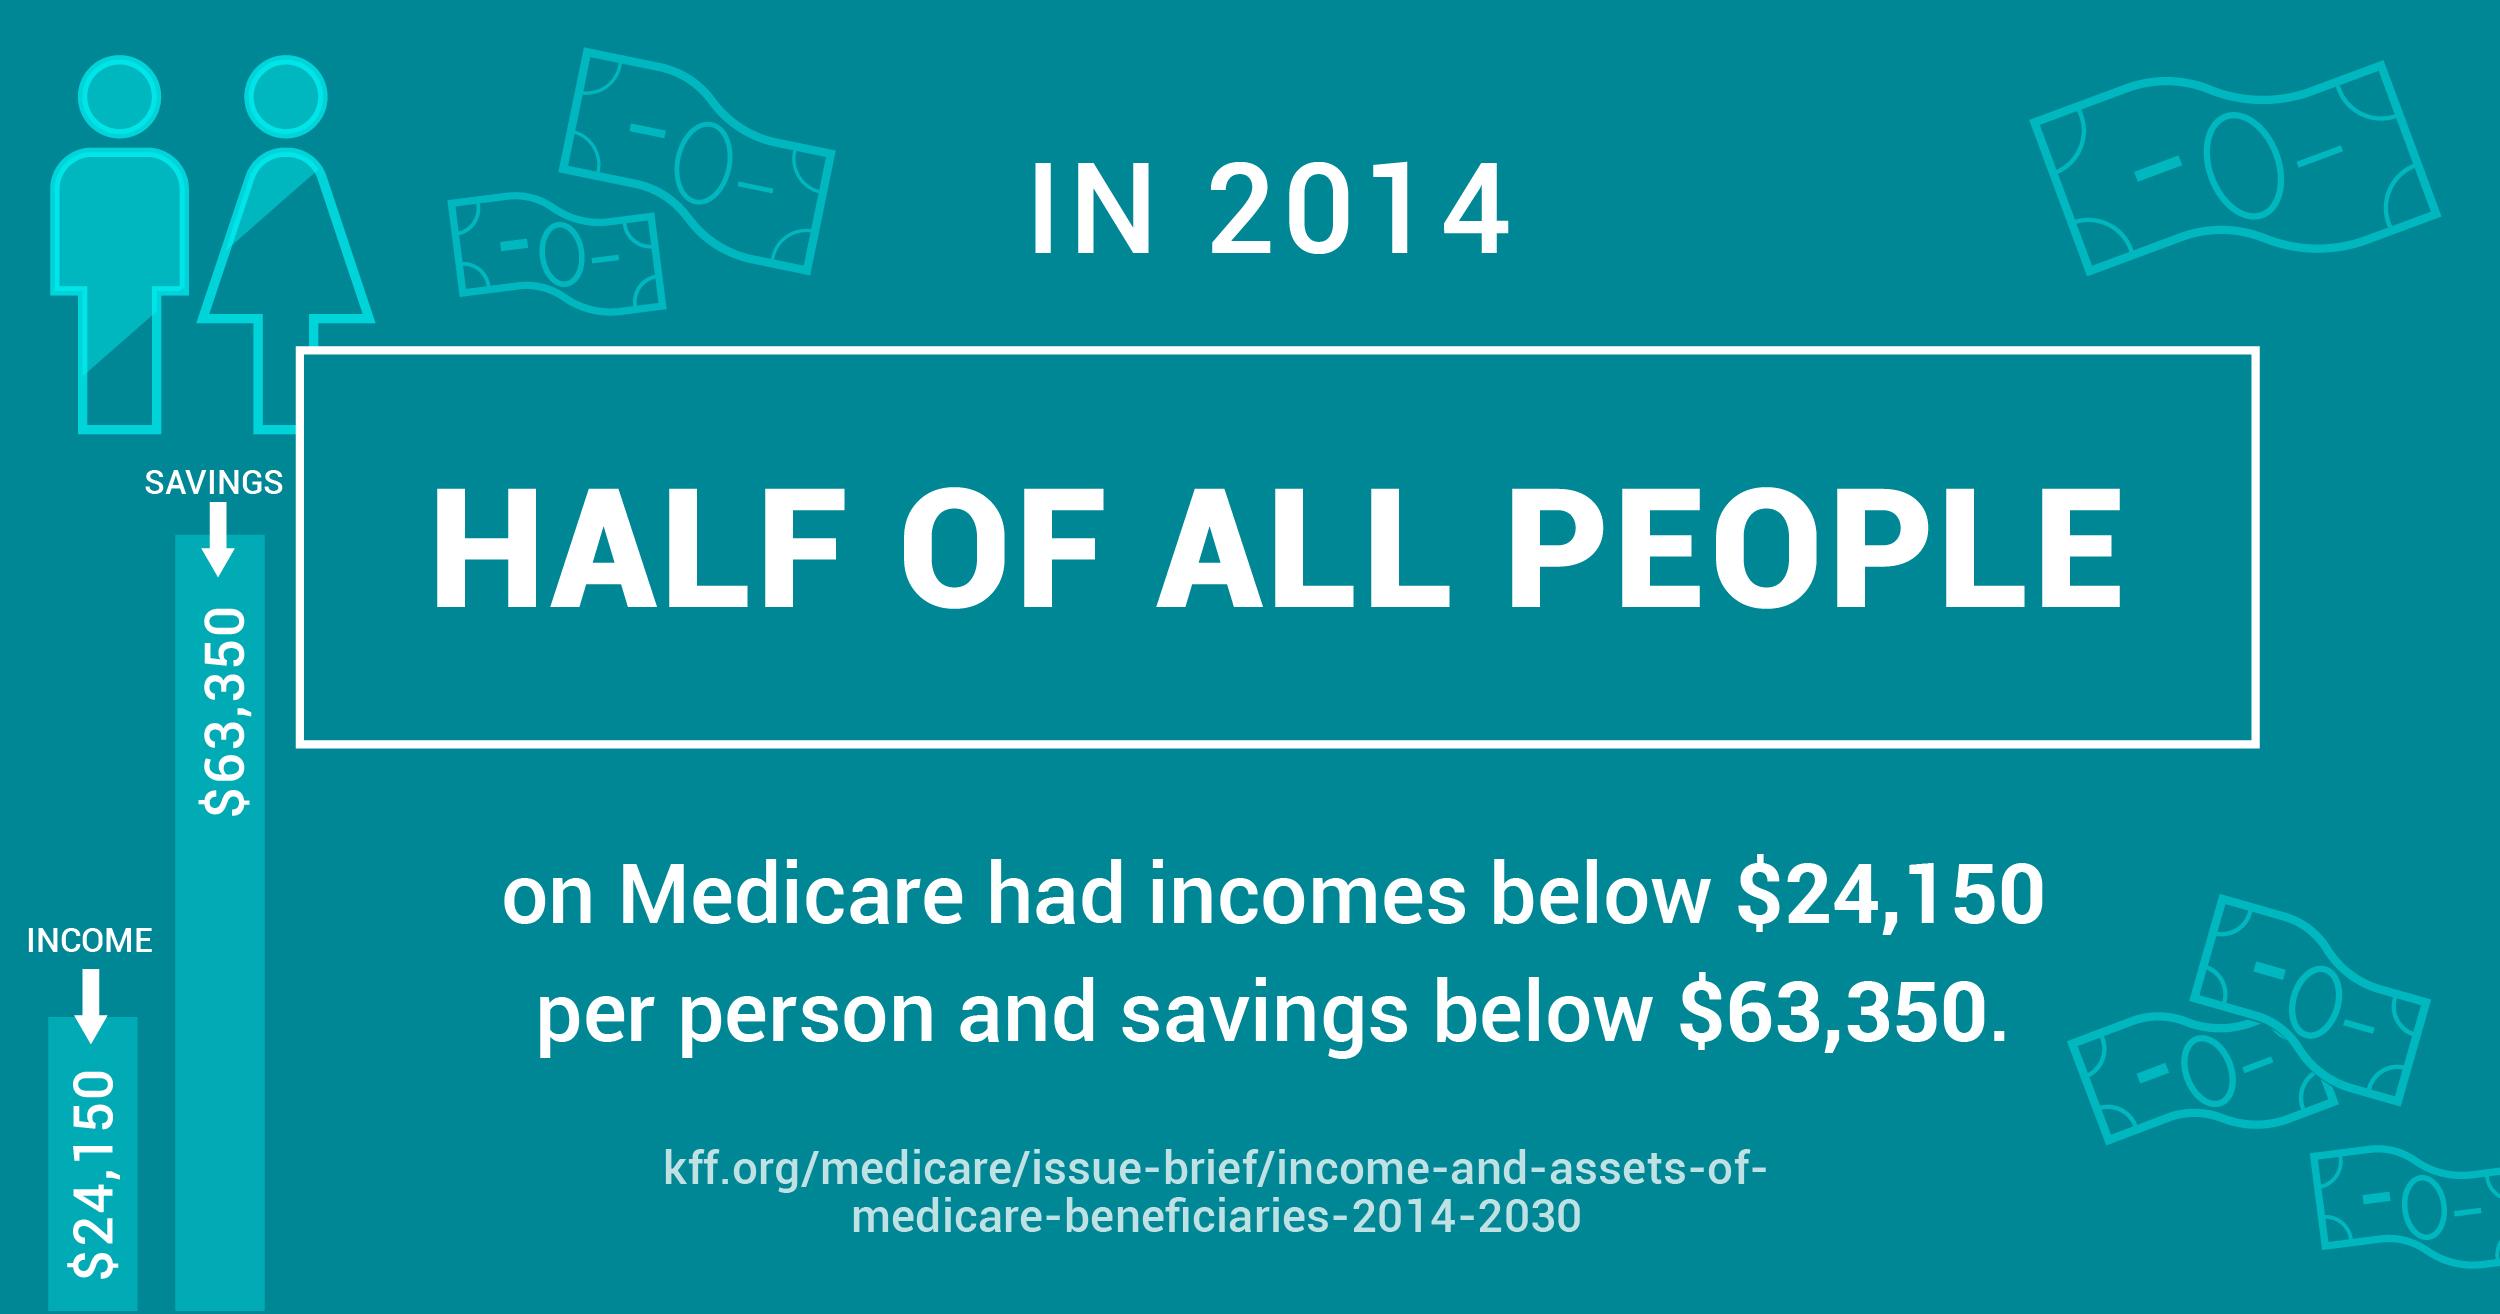 CMA Save Medicare Graphics r3 17-0303-05.jpg